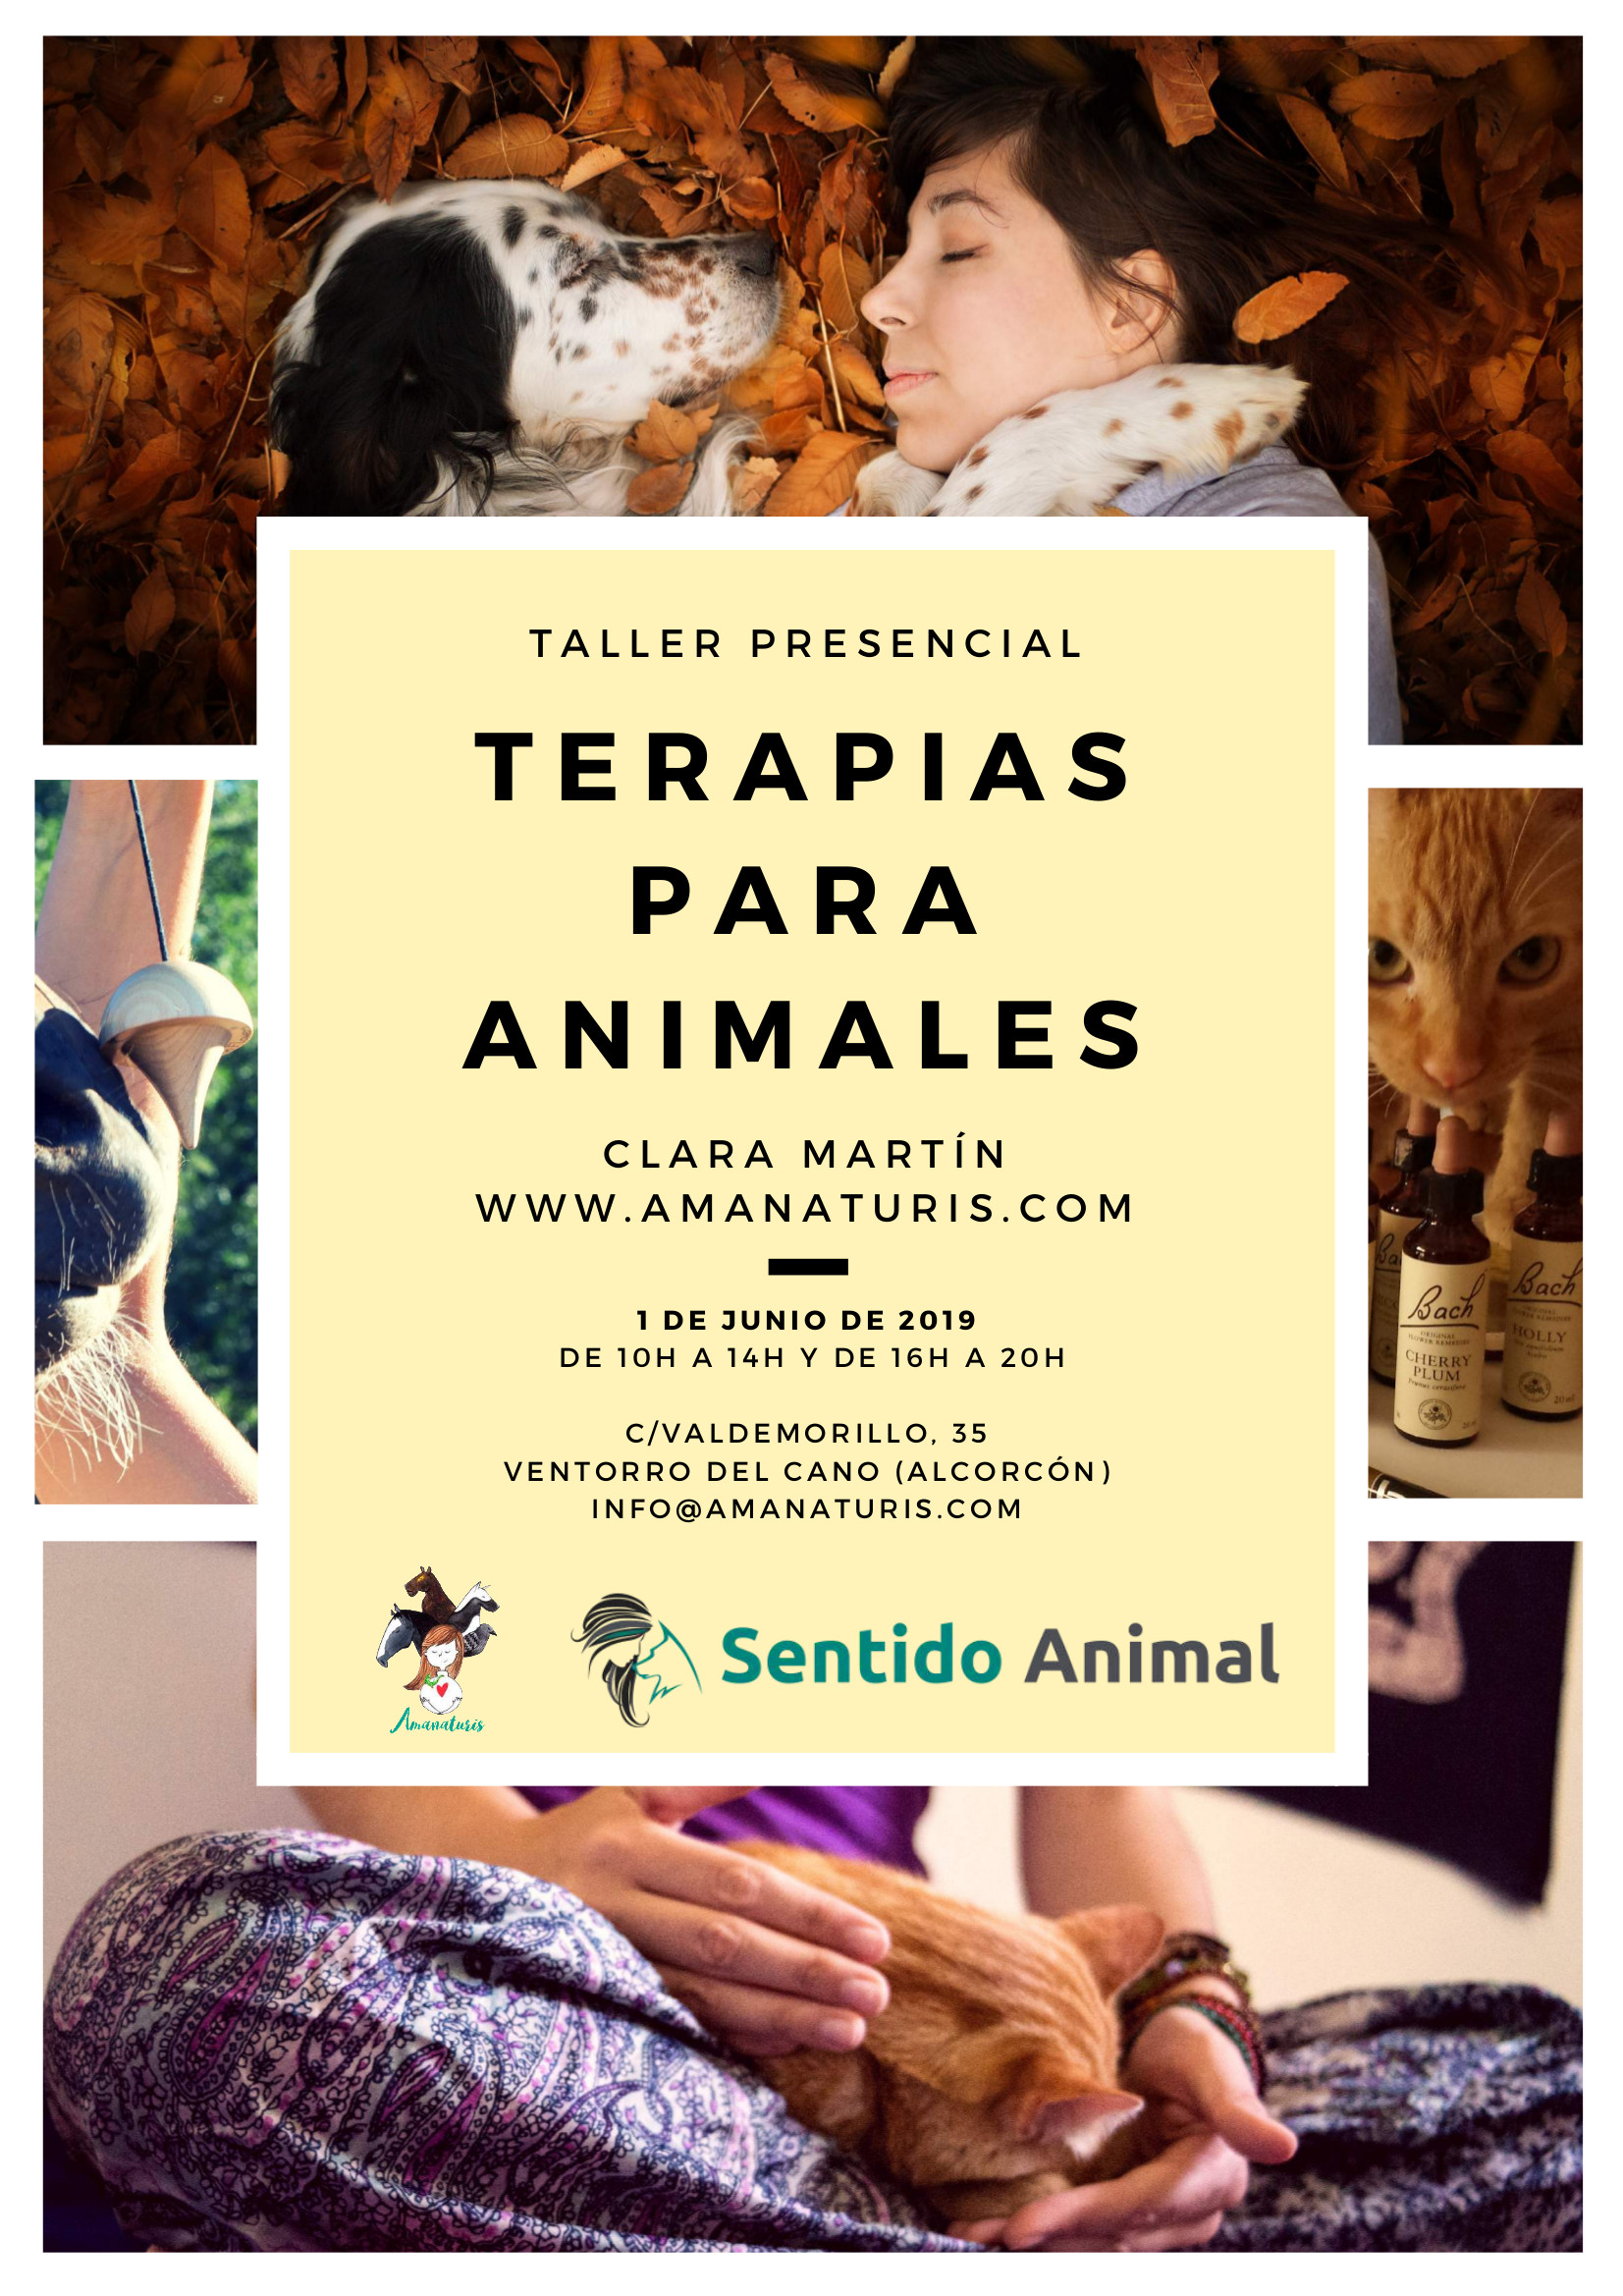 Taller presencial: Terapias naturales para animales